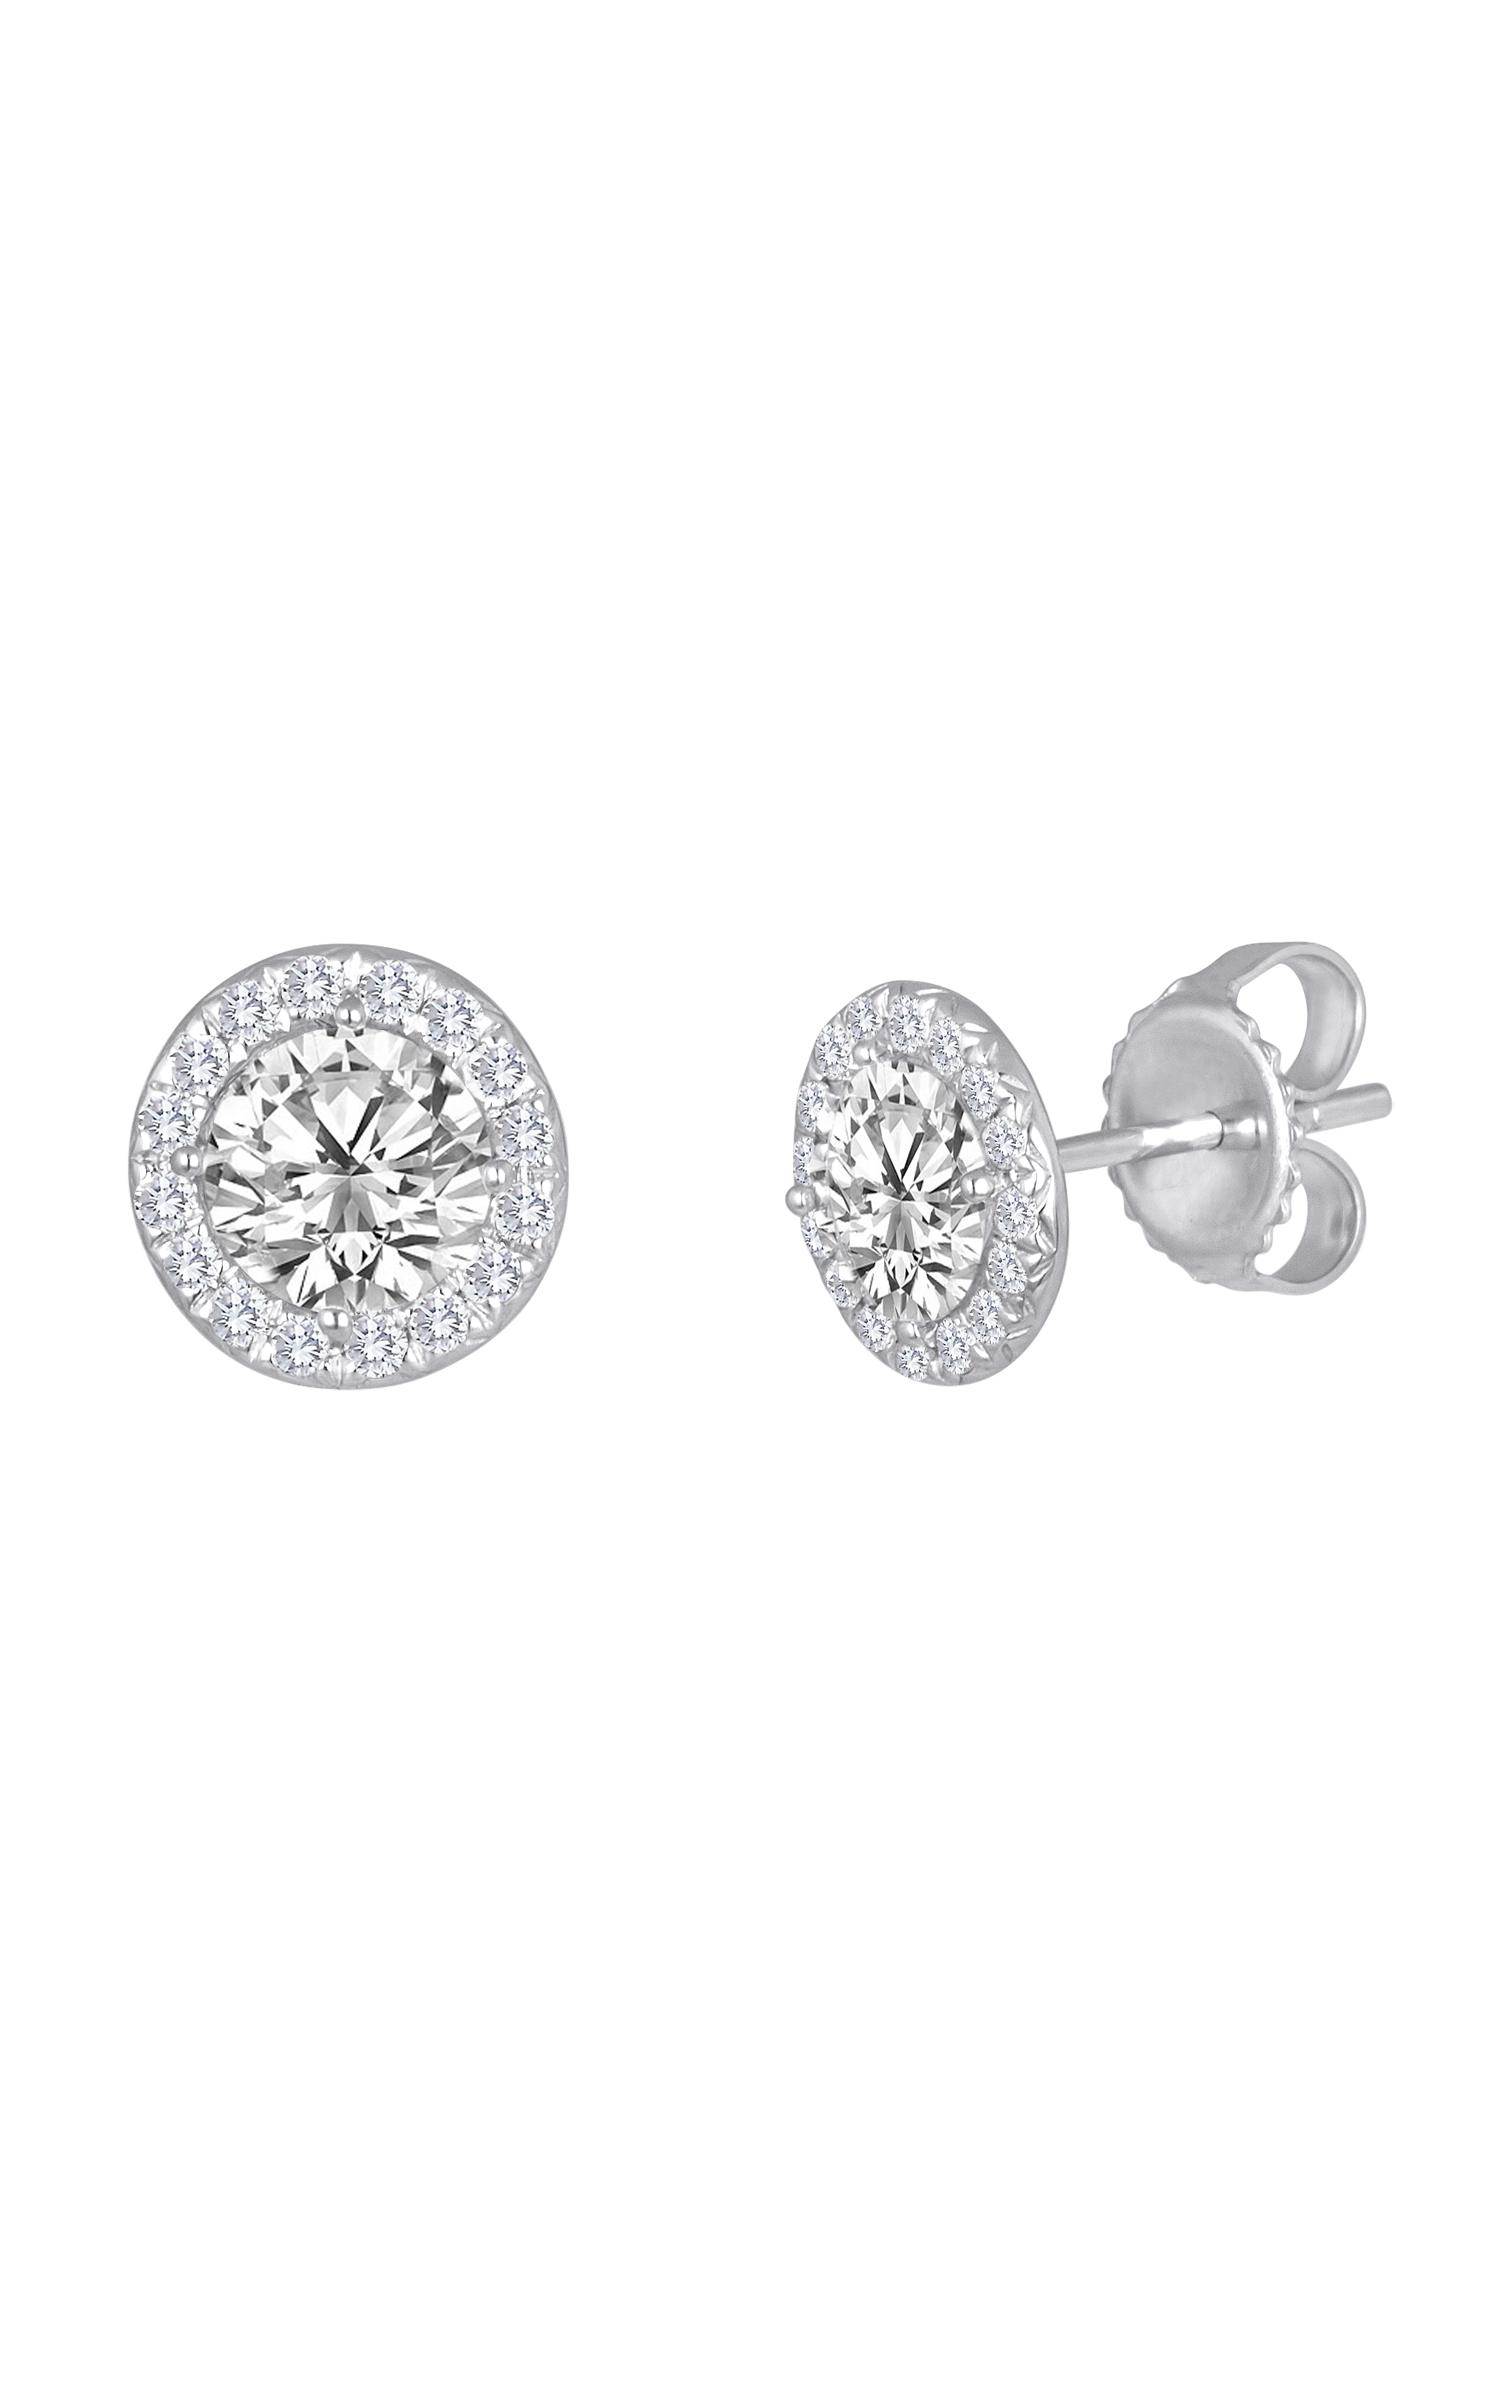 Beny Sofer Earrings SE12-146-3C product image